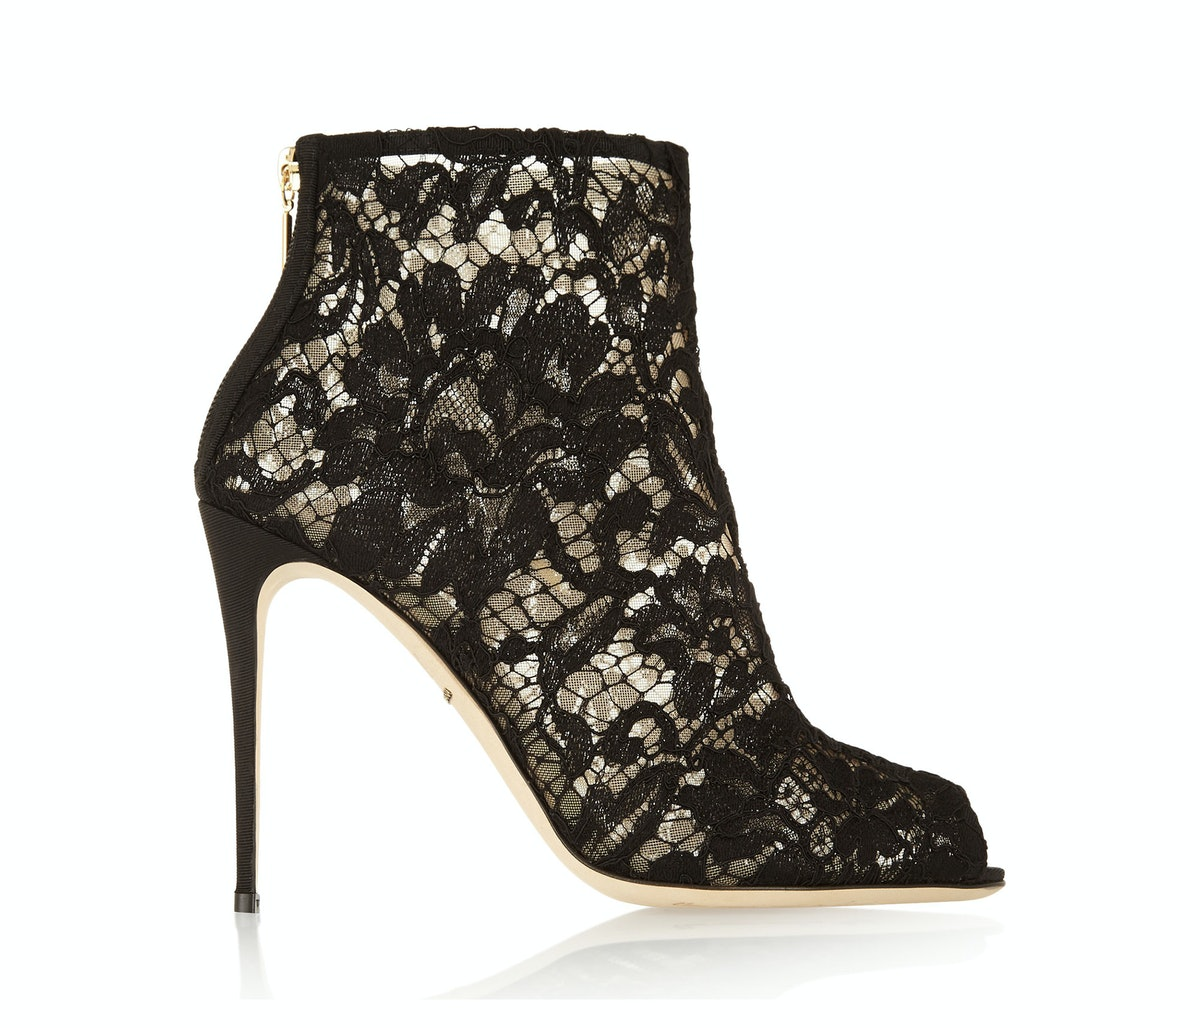 Dolce & Gabbana booties